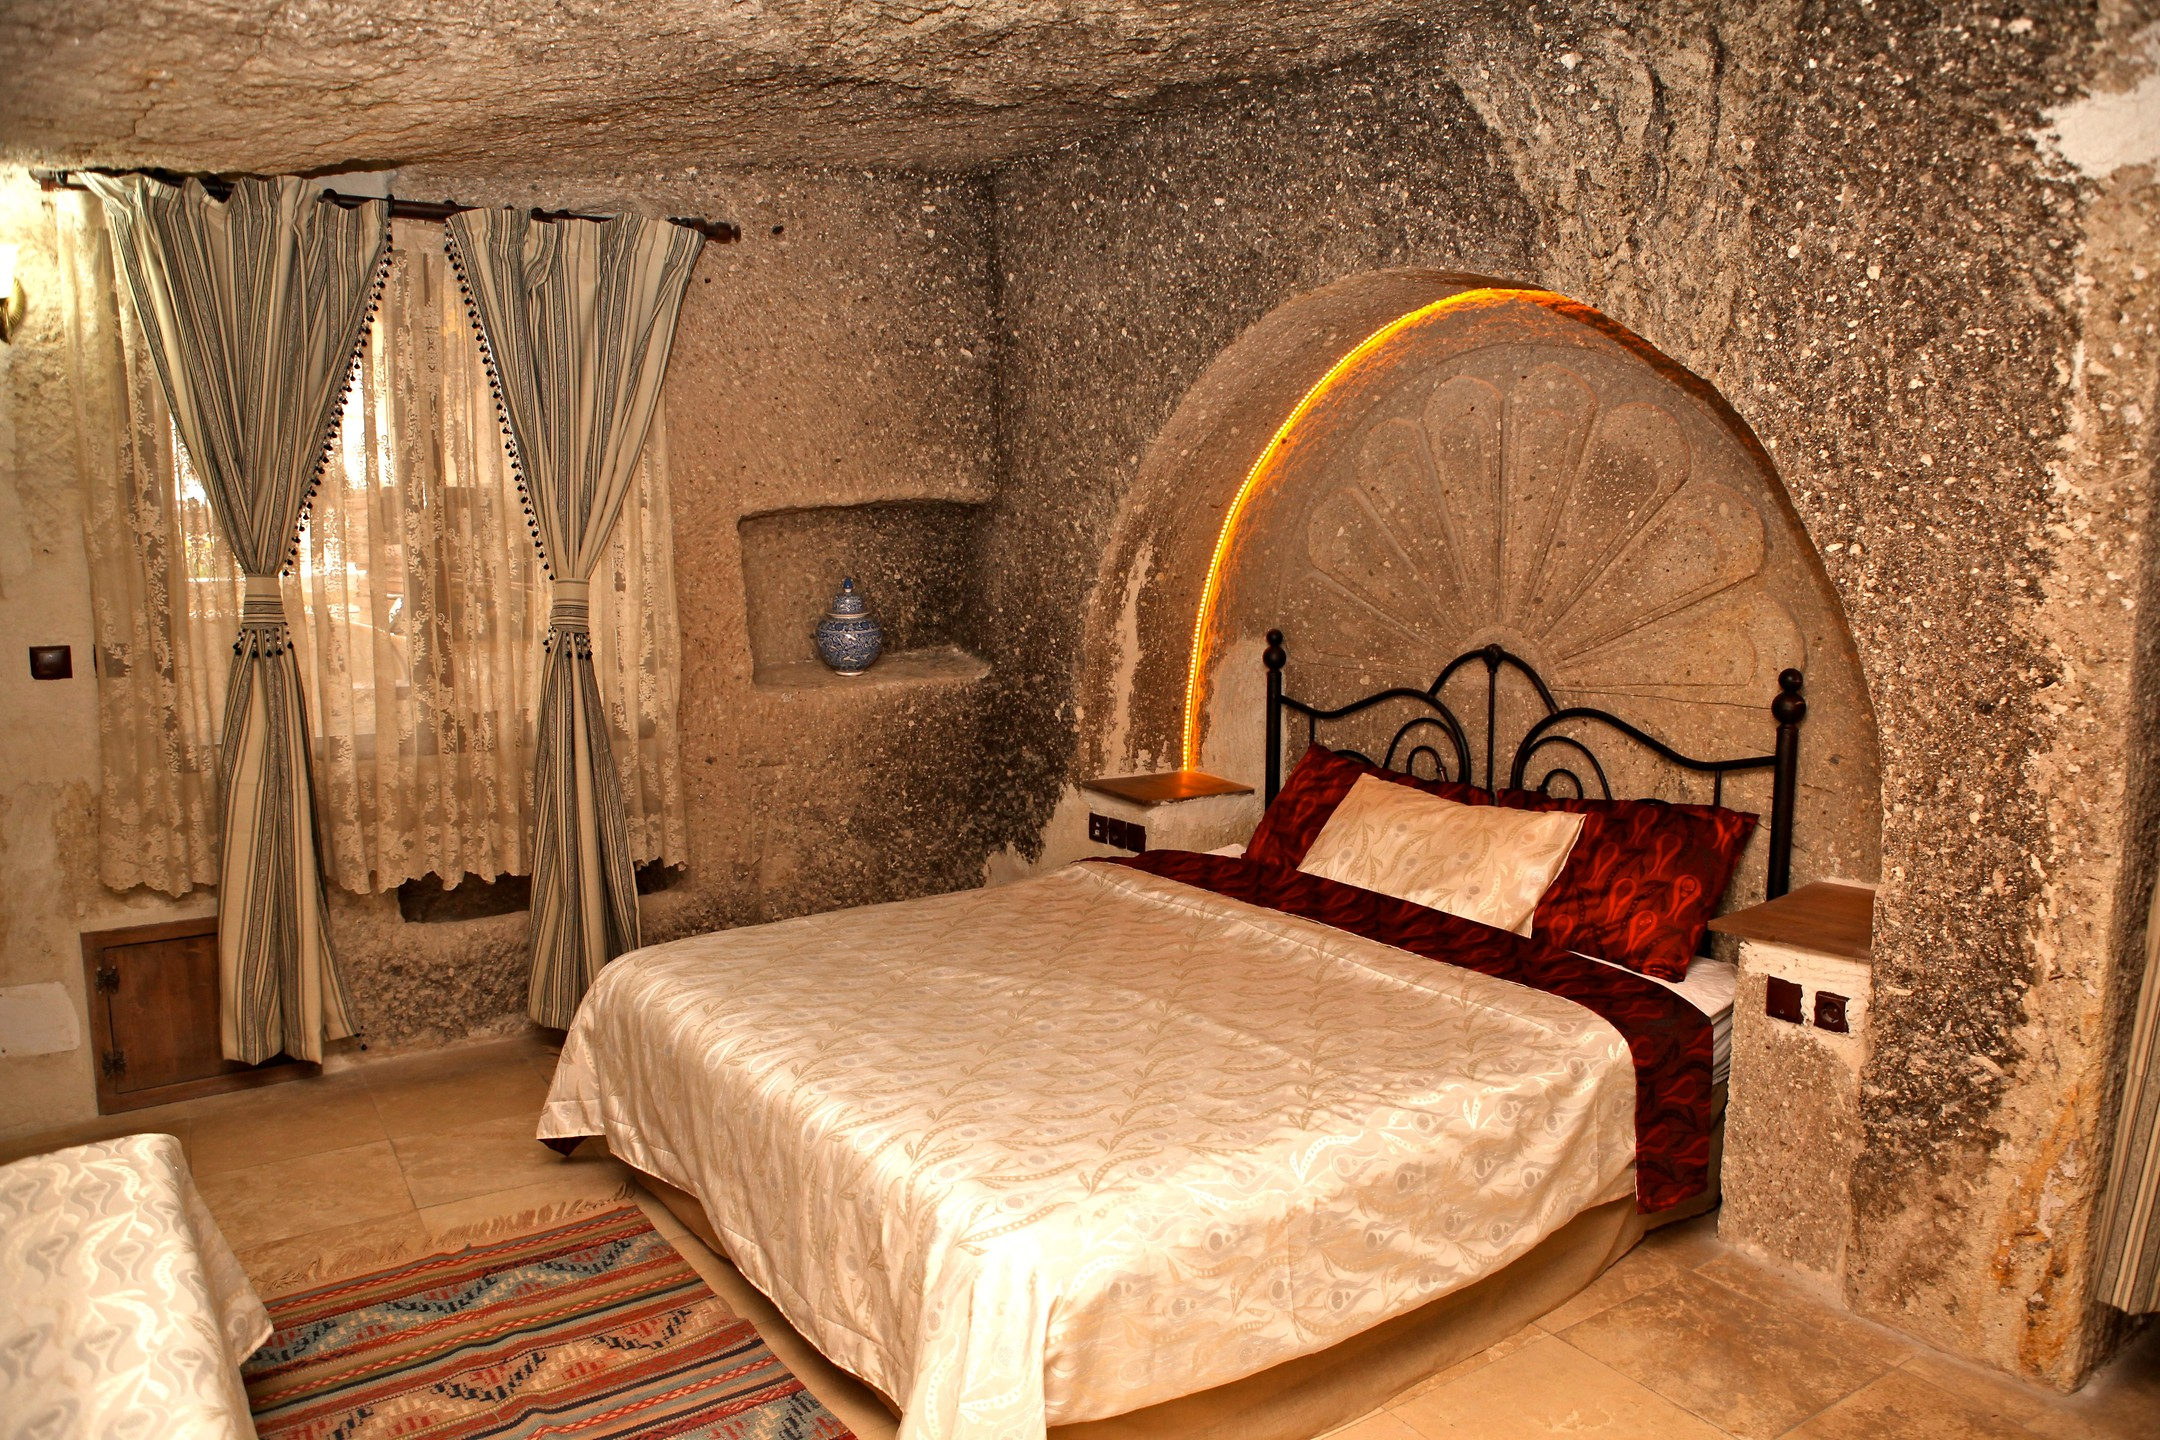 Holiday Cave Hotel - Kapadokya Hakkında Her şey